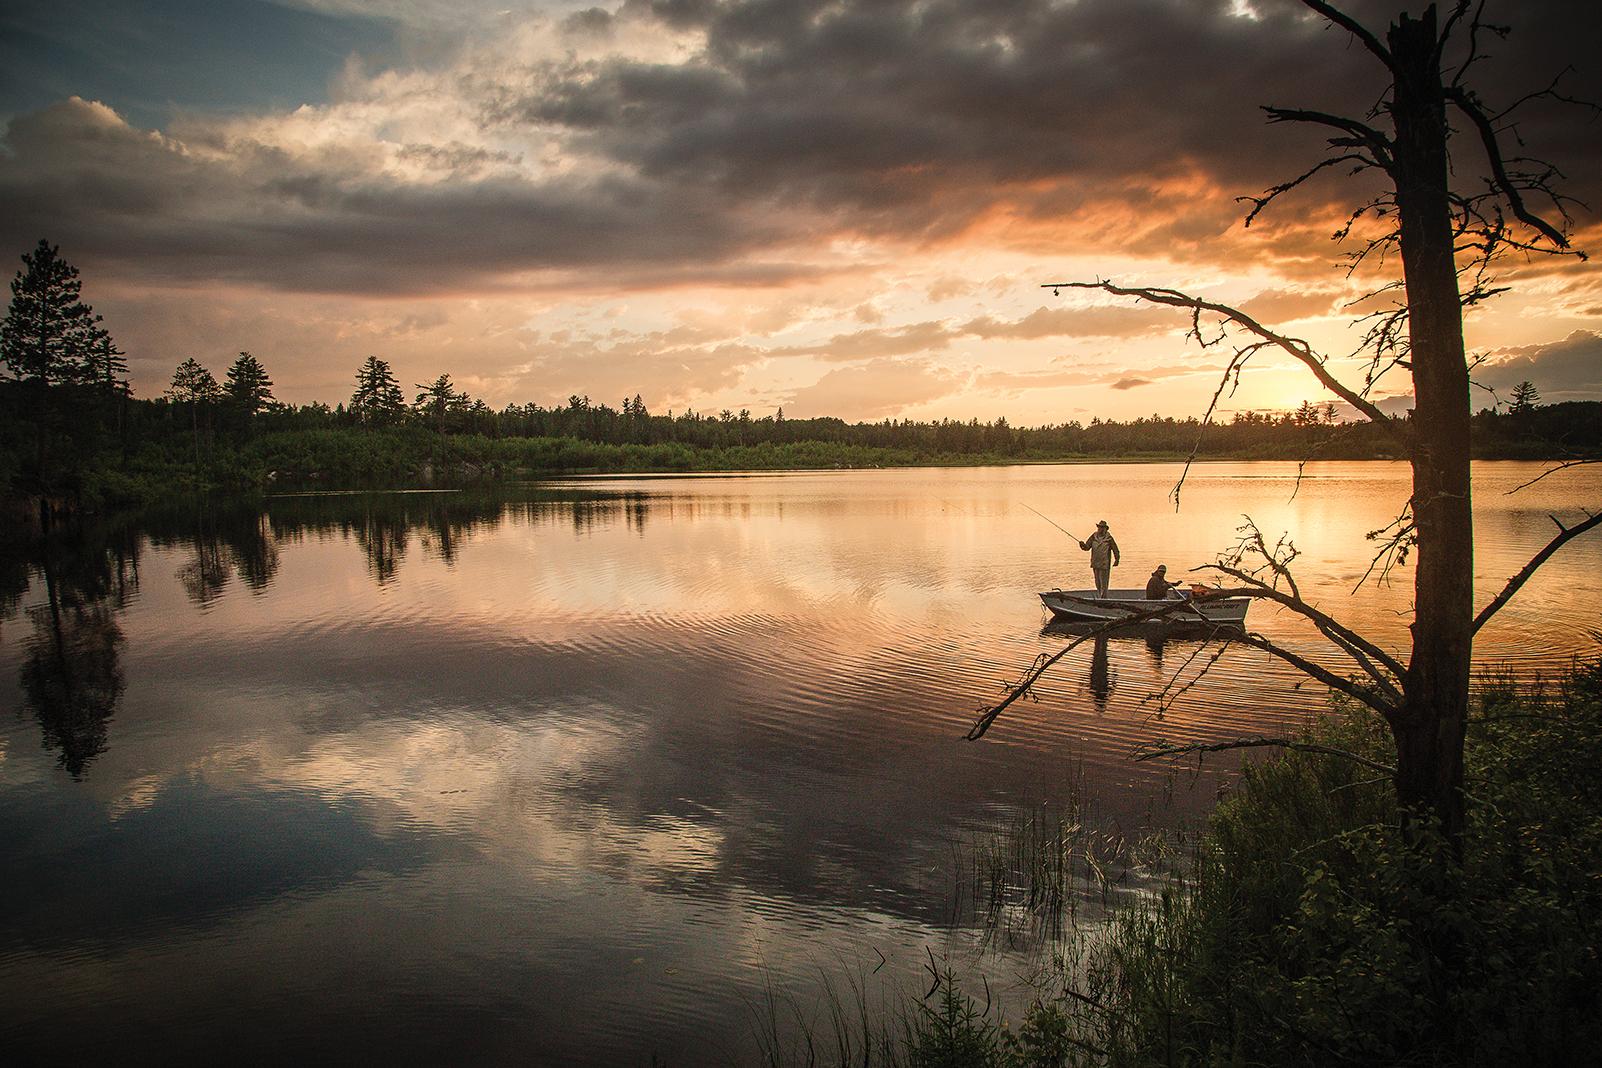 Fishing on Shoepack Lake in northern Minnesota